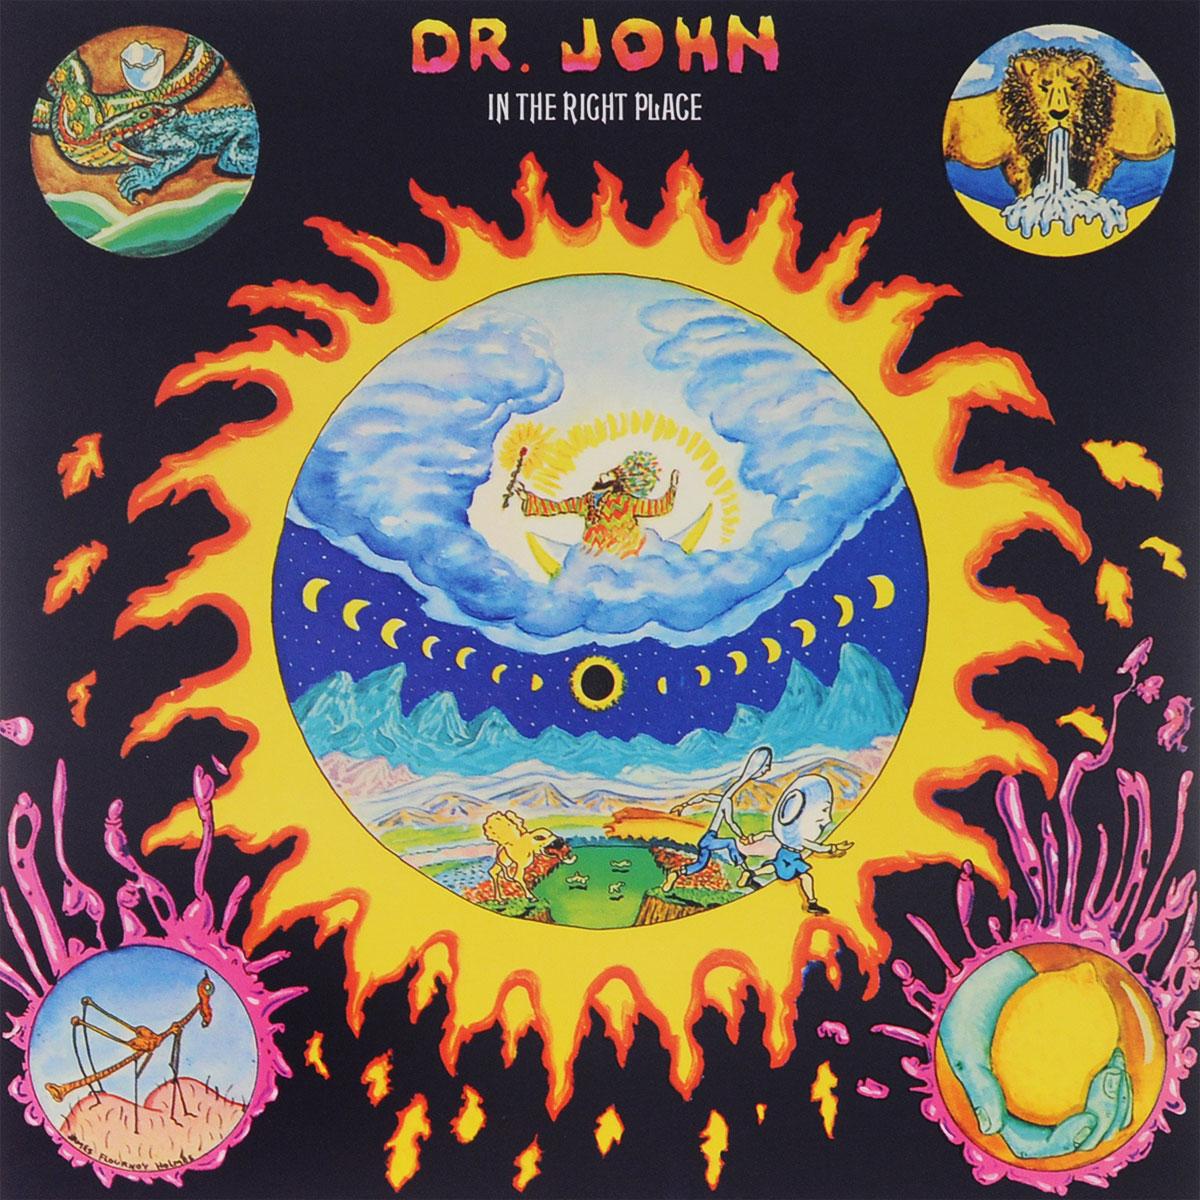 Доктор Джон Dr. John. In The Right Place (LP) доктор джон dr john locked down